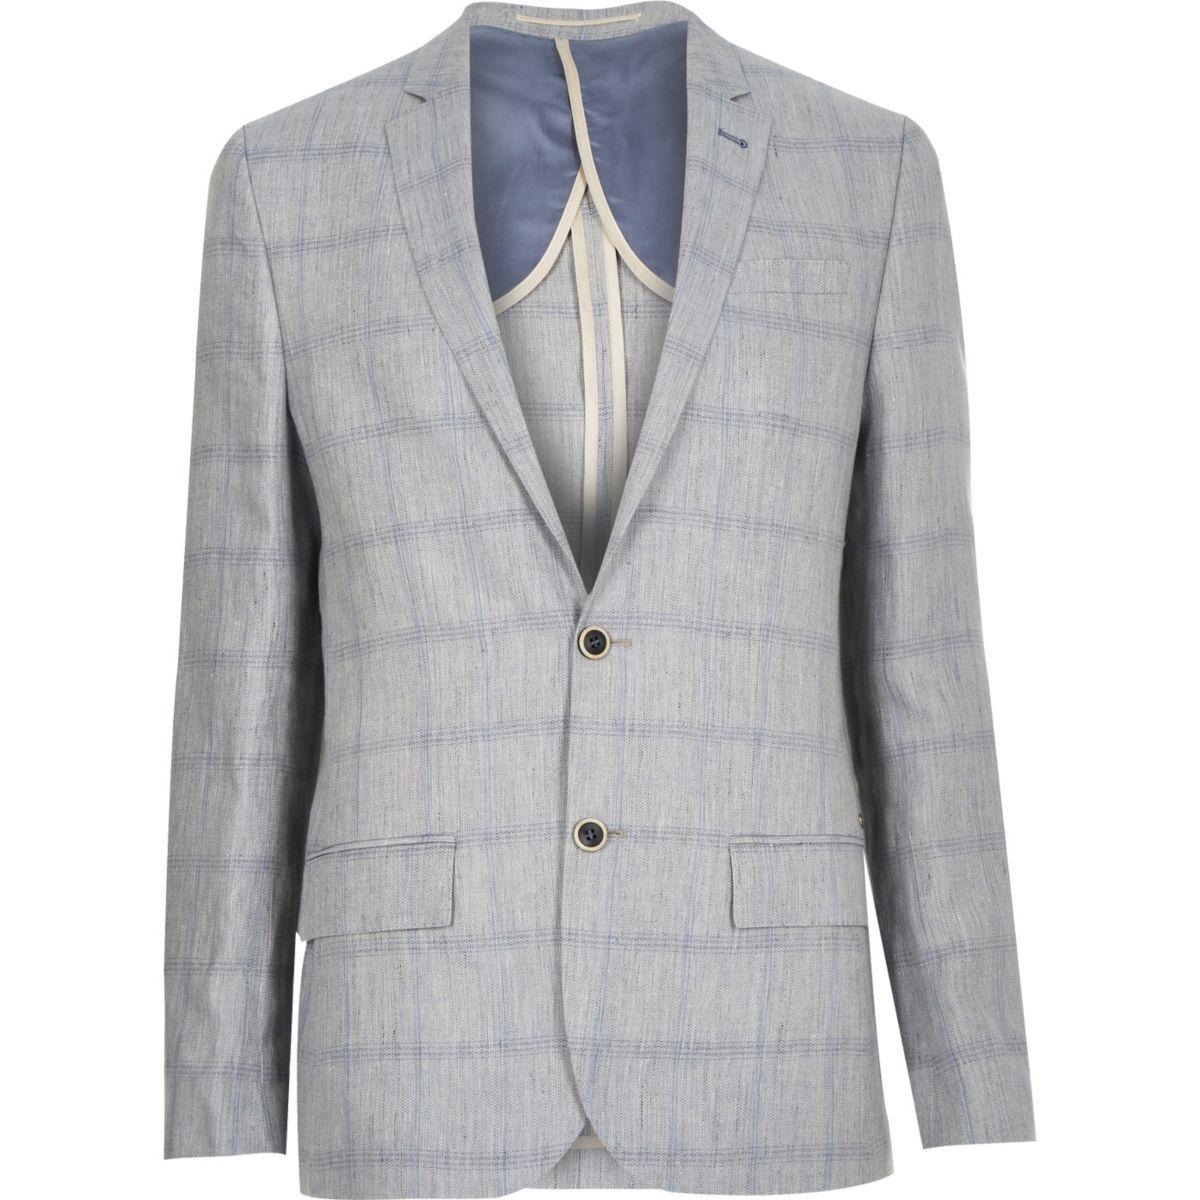 Grey Check Linen Blend Blazer Blazers Sale Men